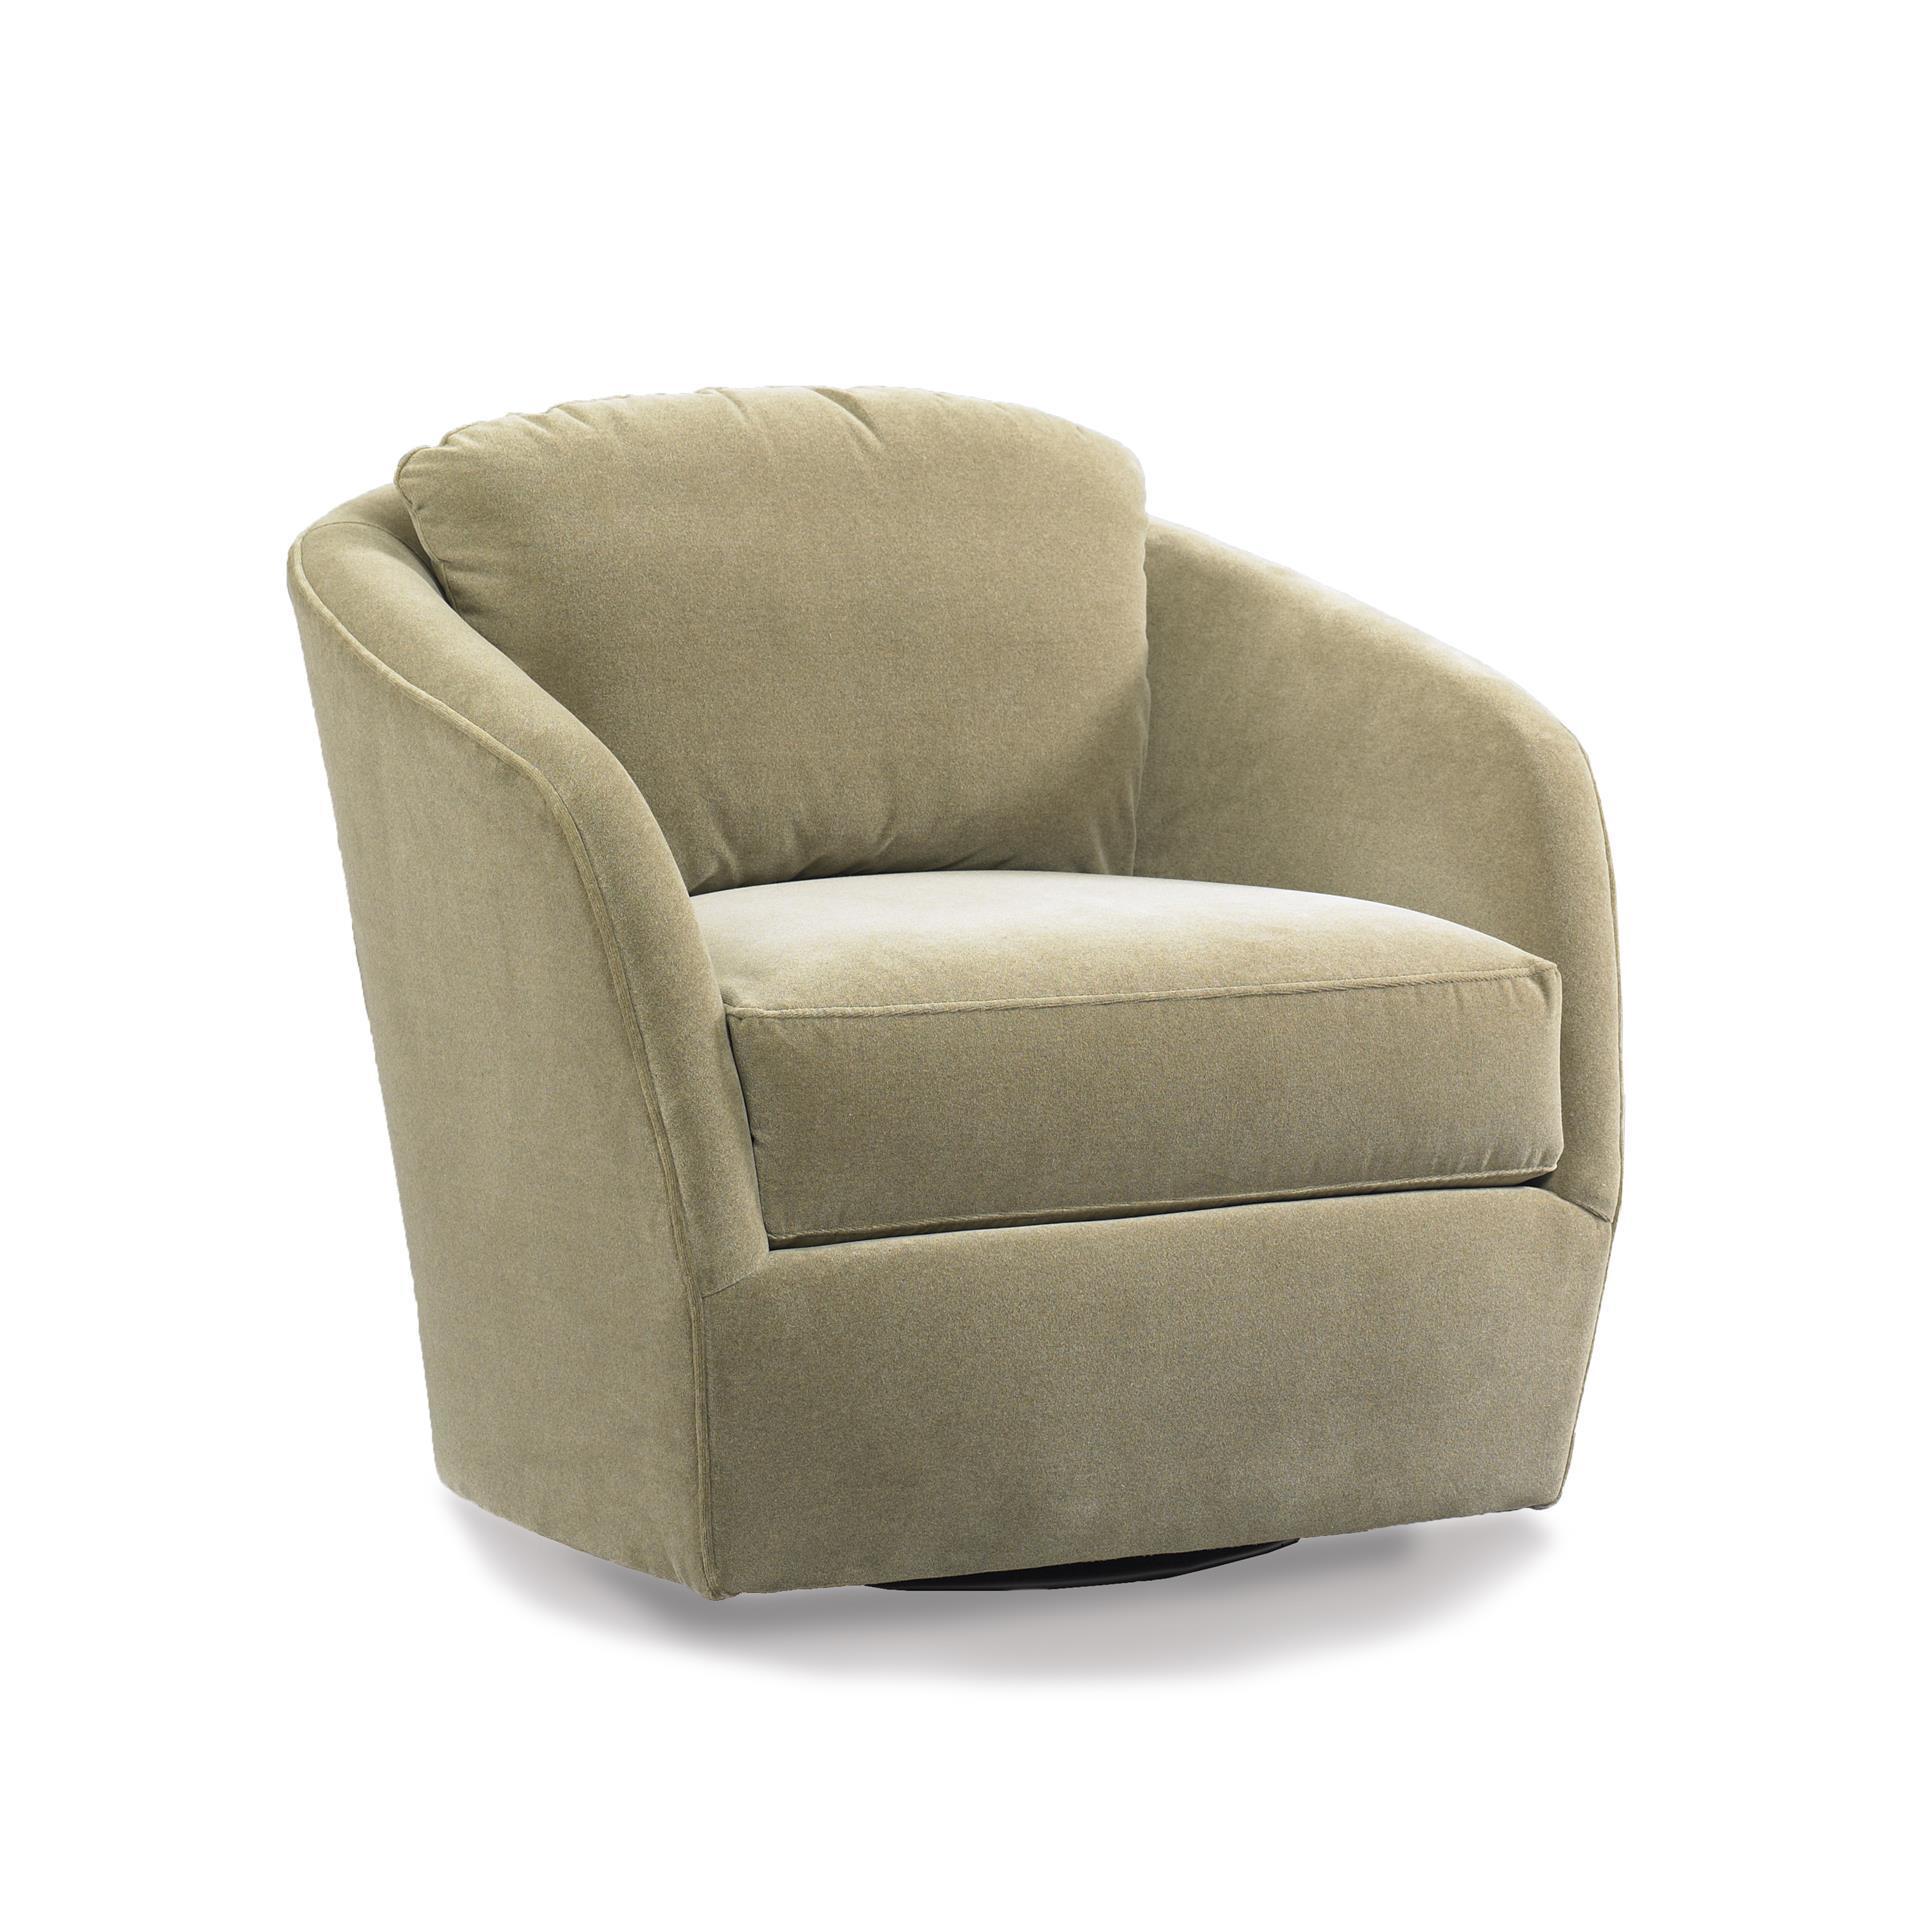 American Made Gordon Swivel Accent Chair